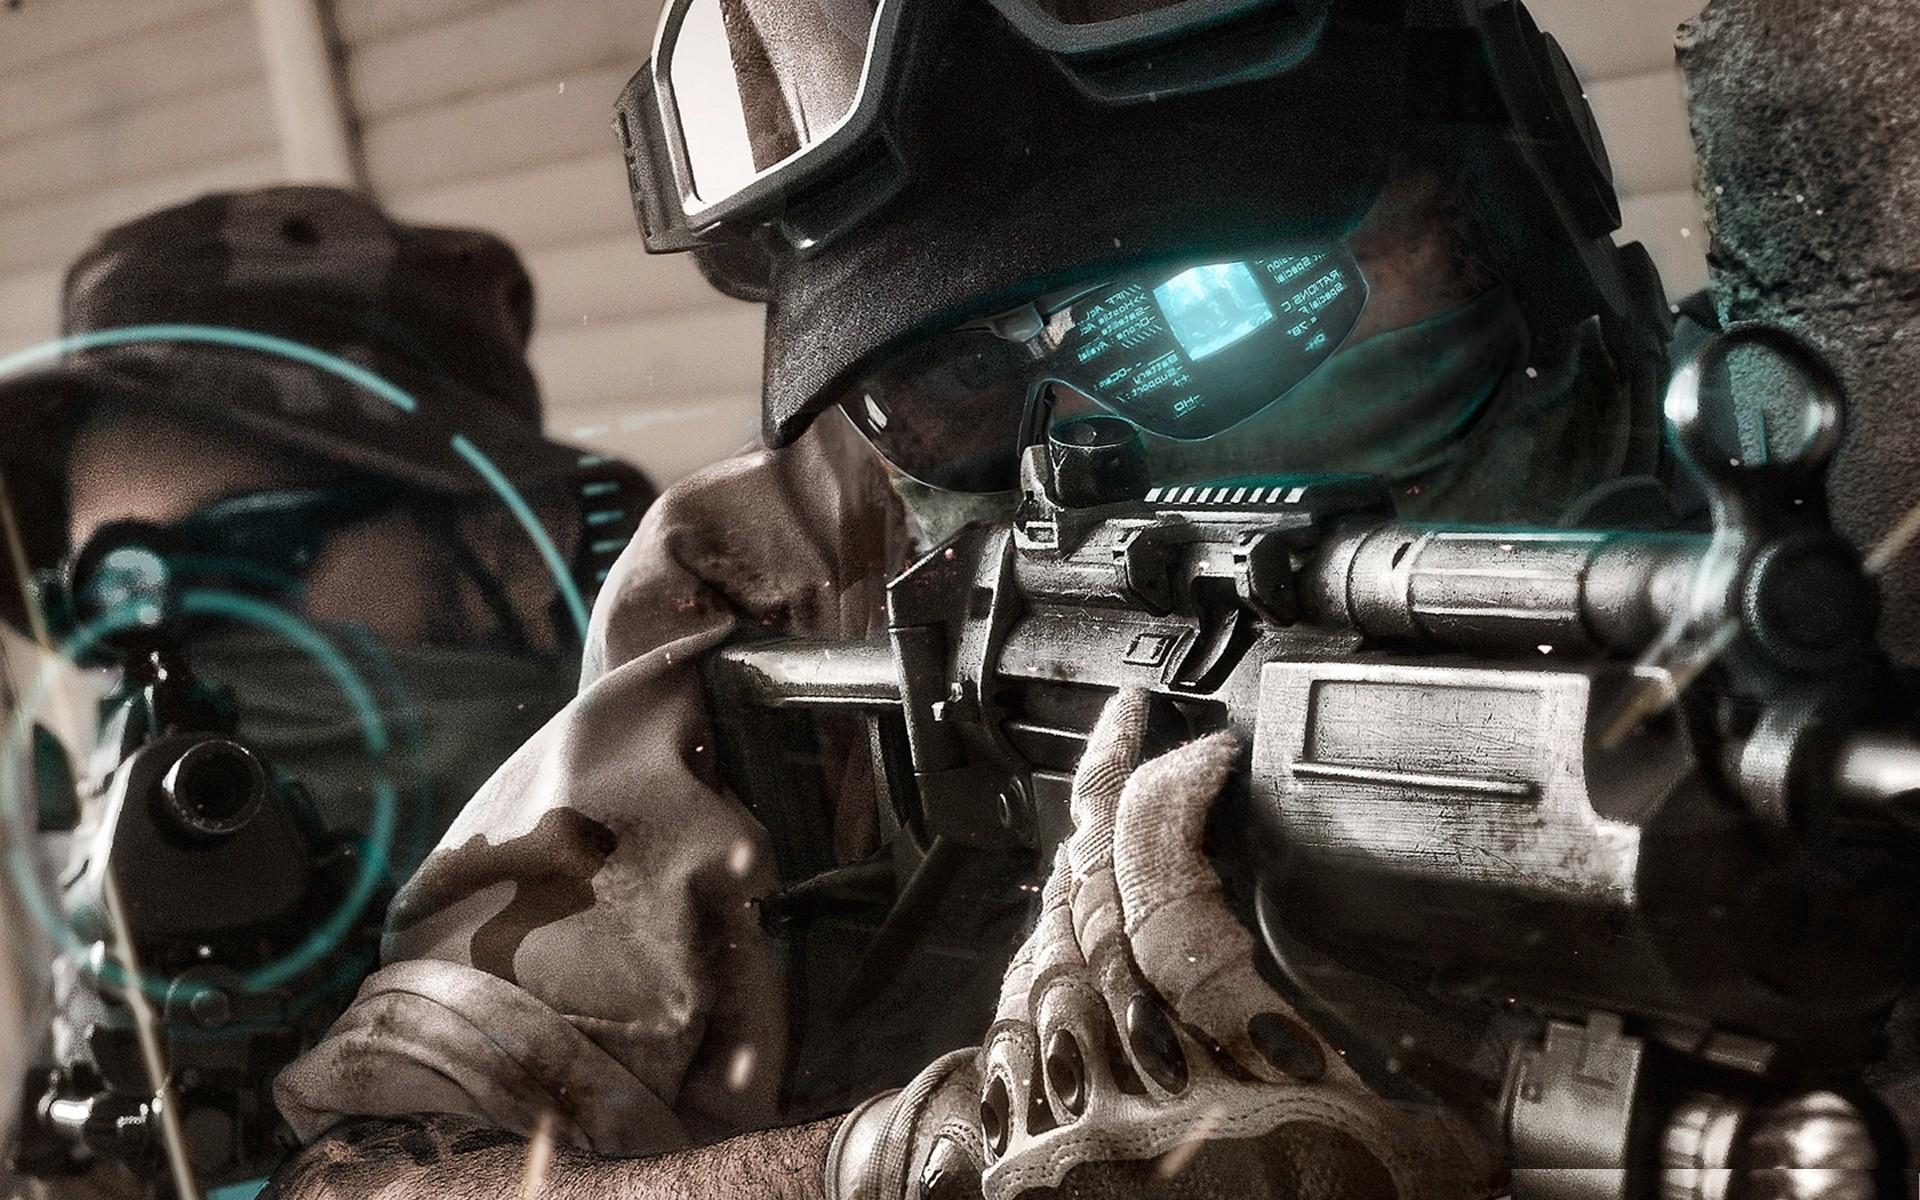 Kozak - Ghost Recon Future Soldier (CF2012) by Hangmen13 on DeviantArt